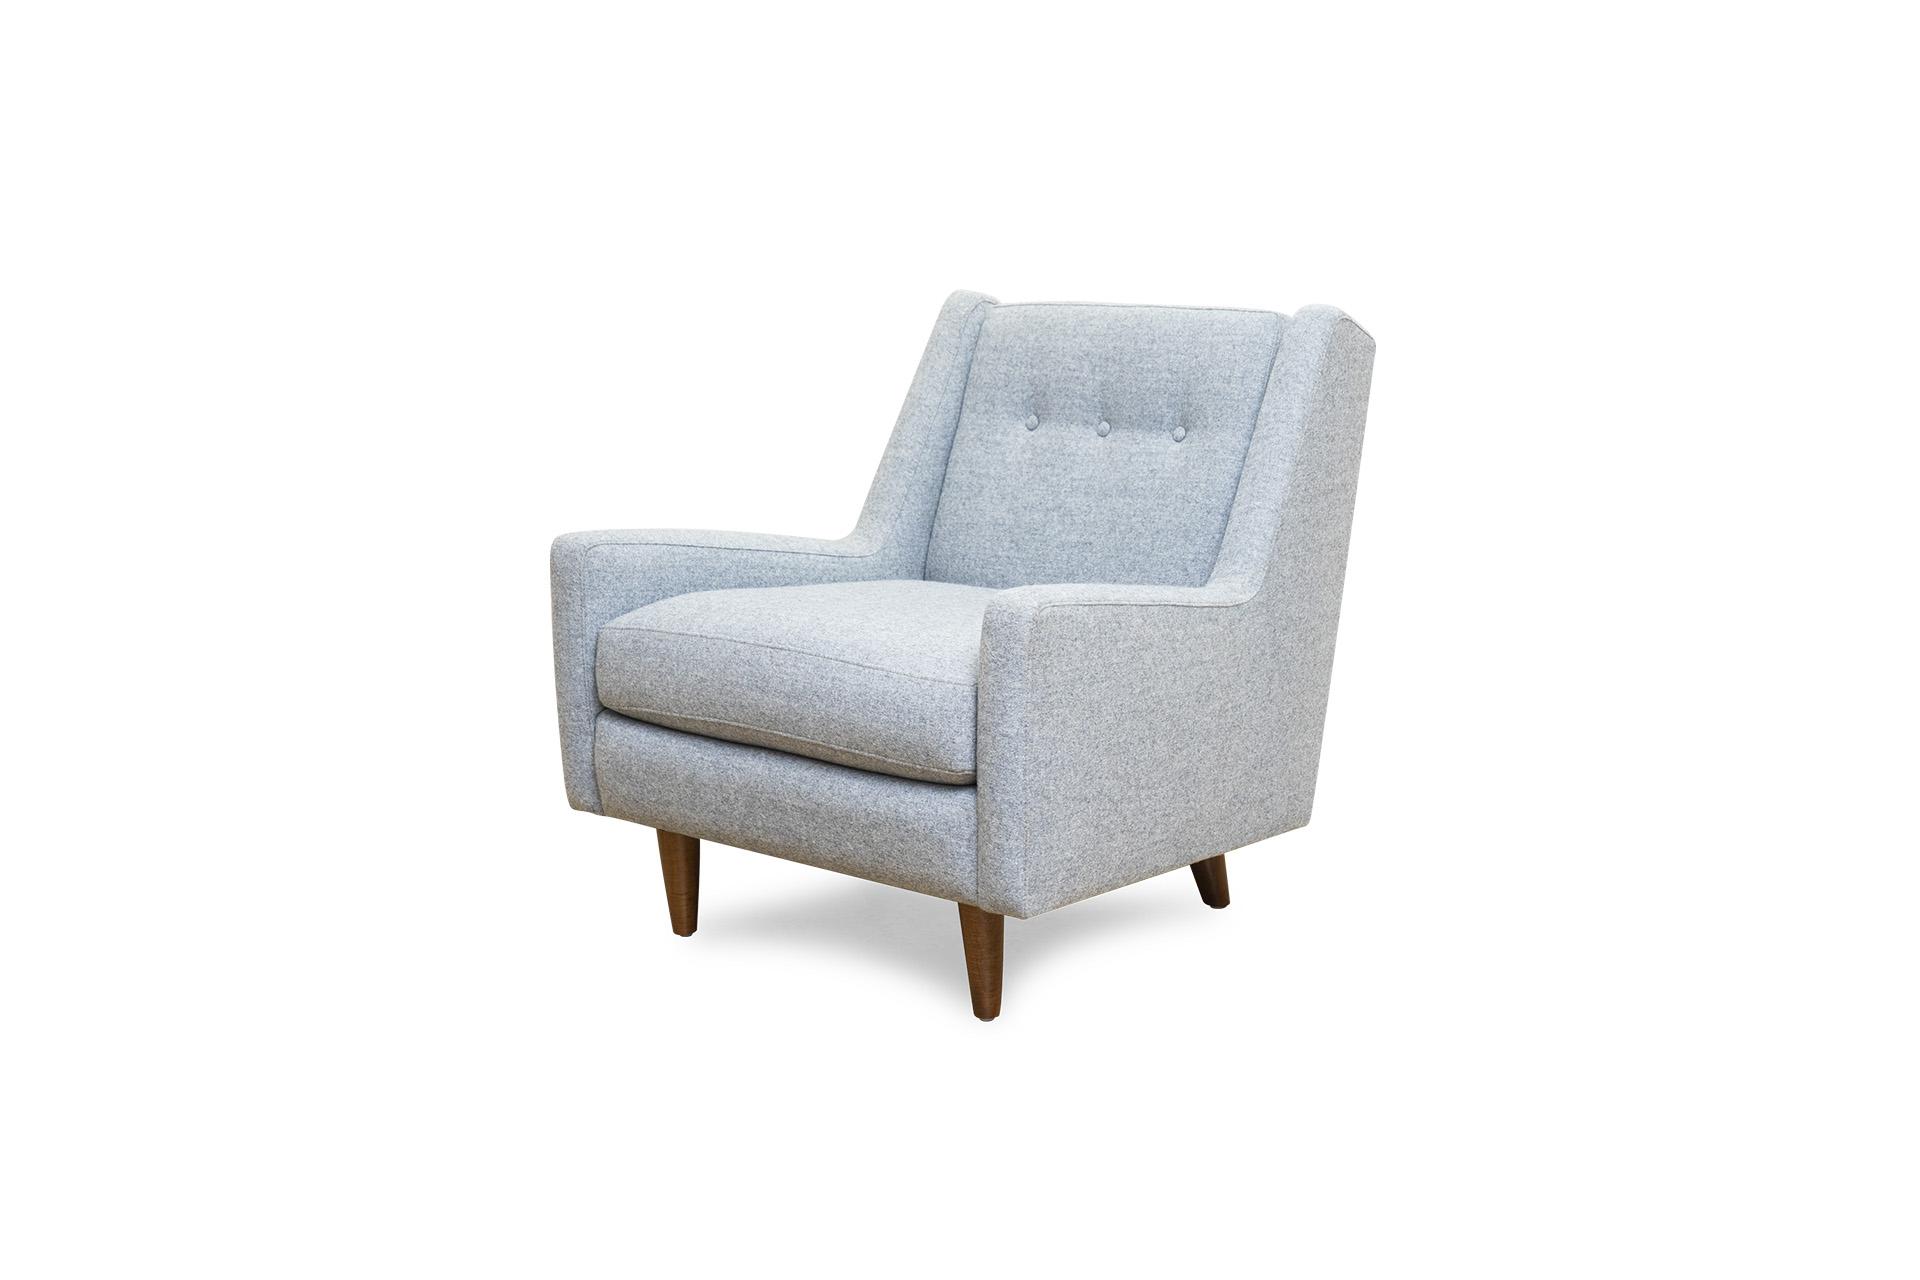 Boulevard Chair